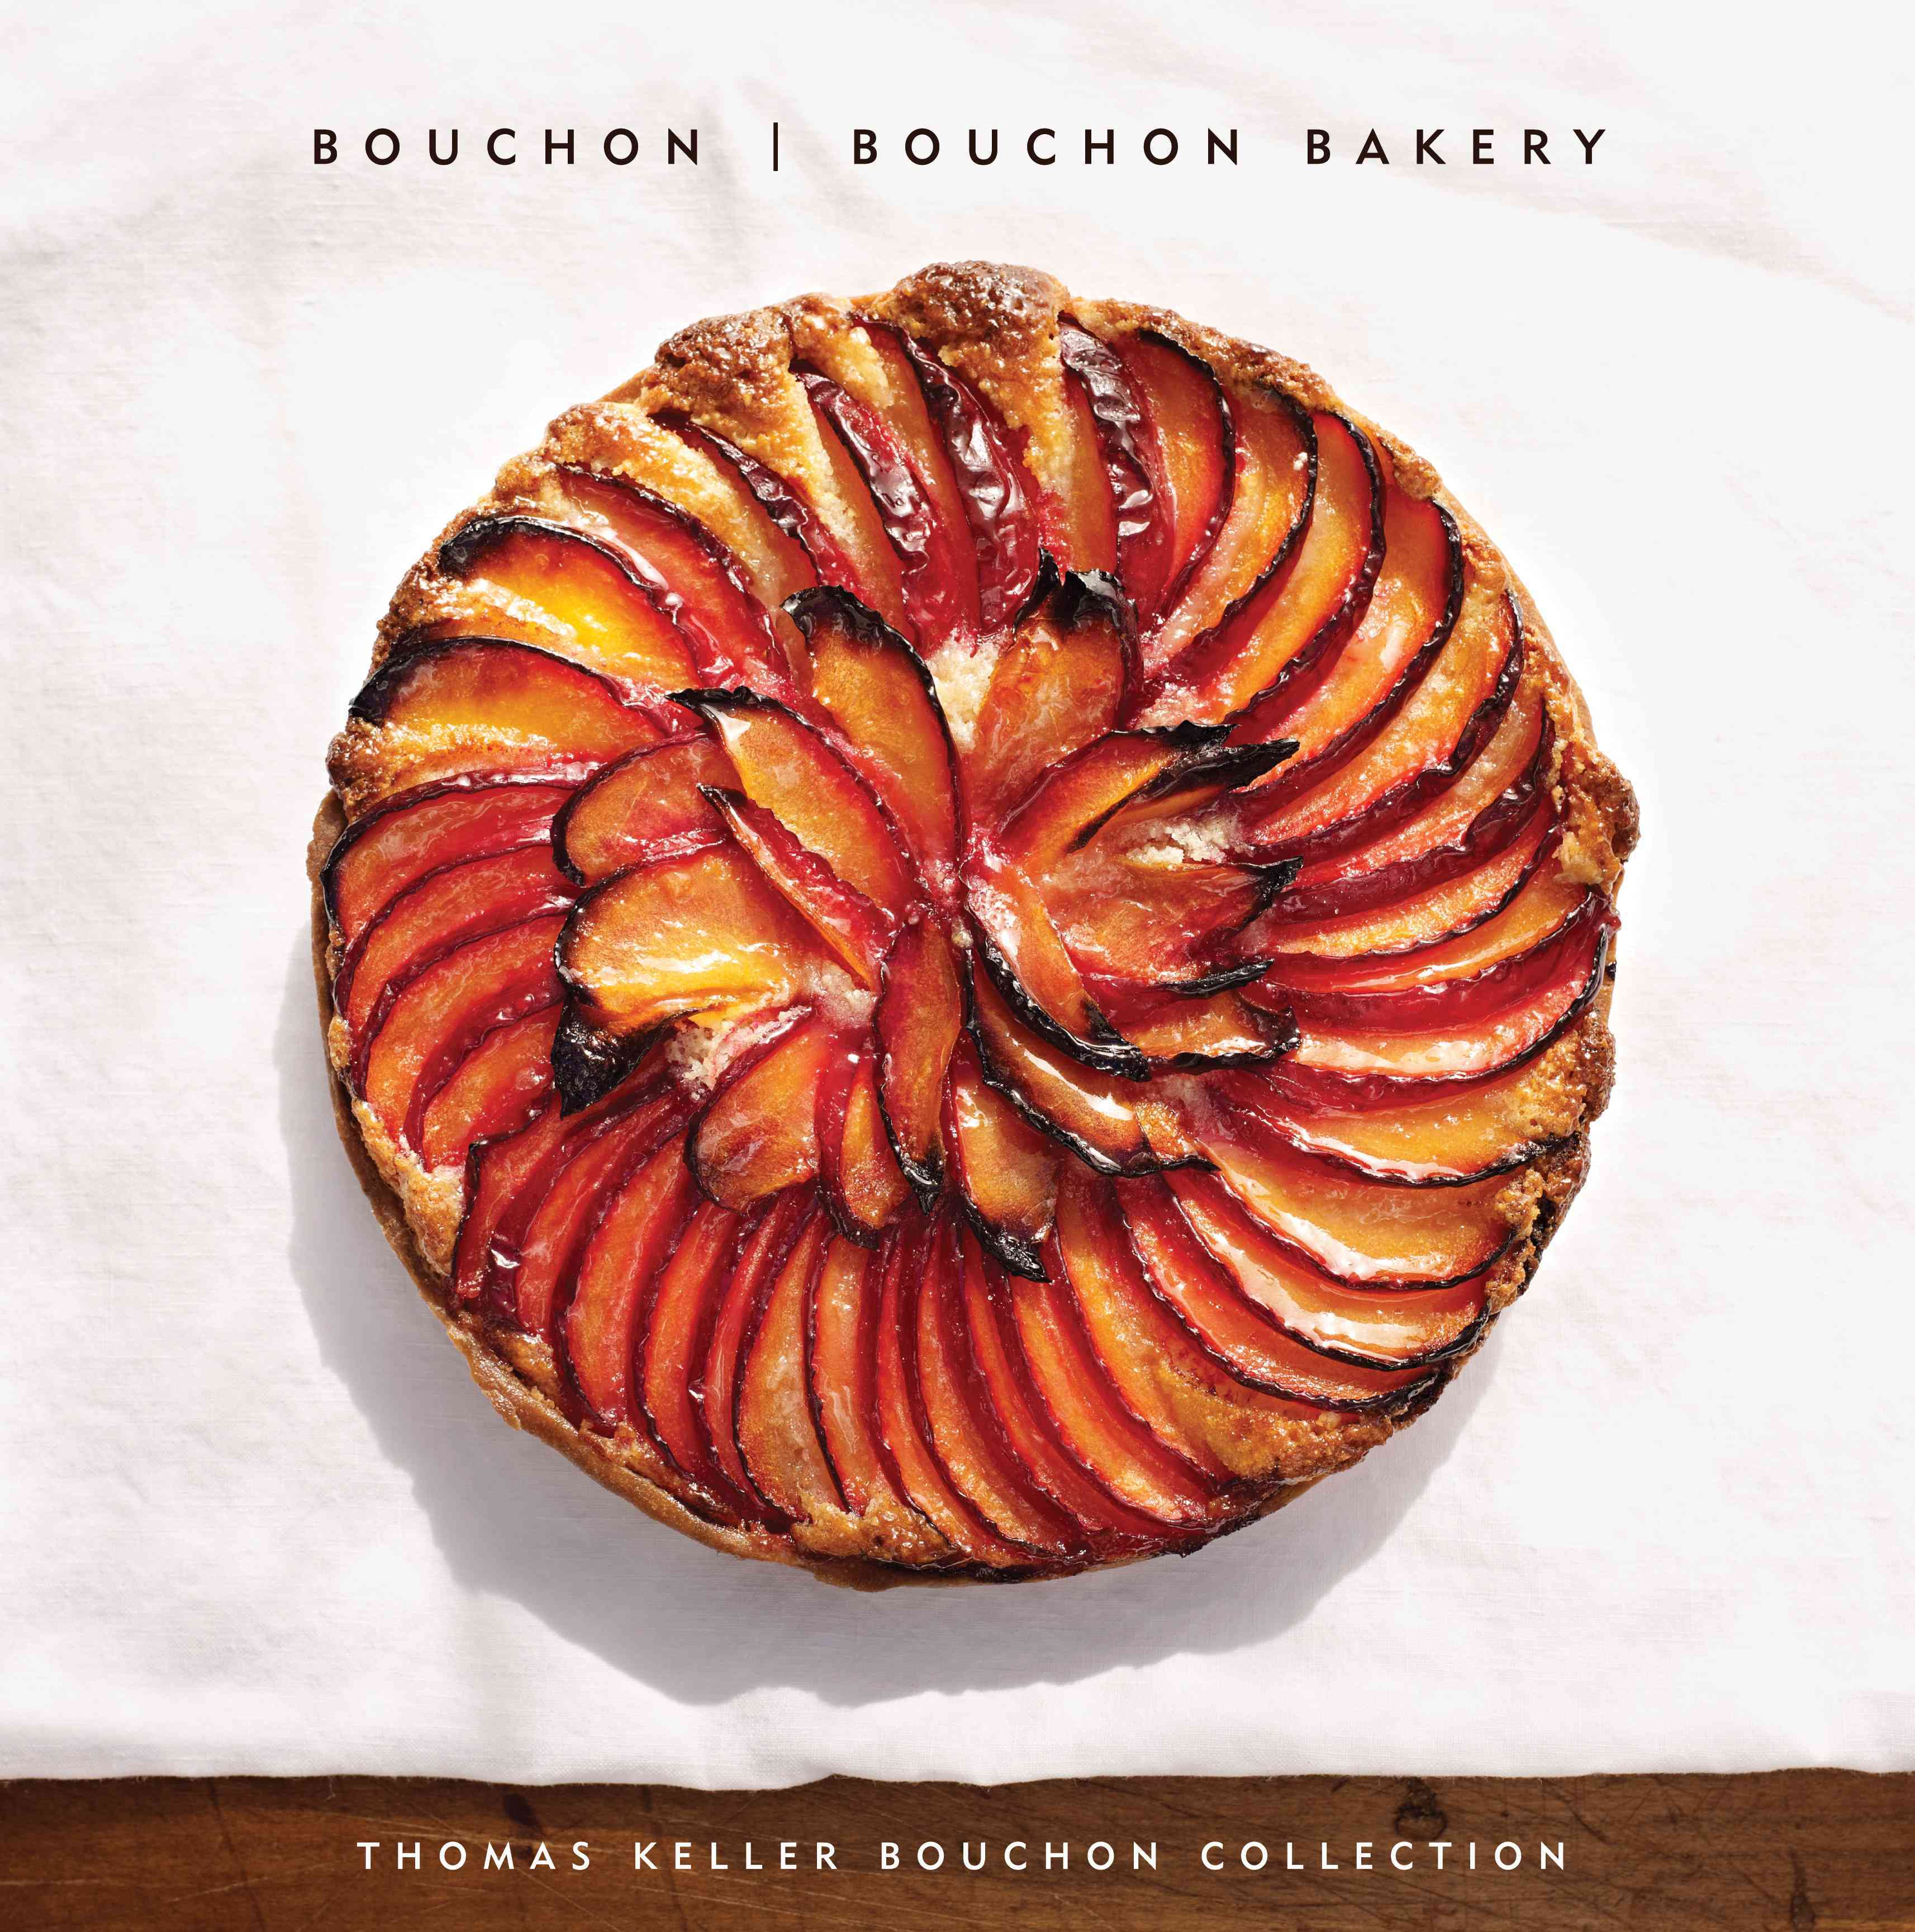 Thomas Keller Bouchon Collection (Hardcover)